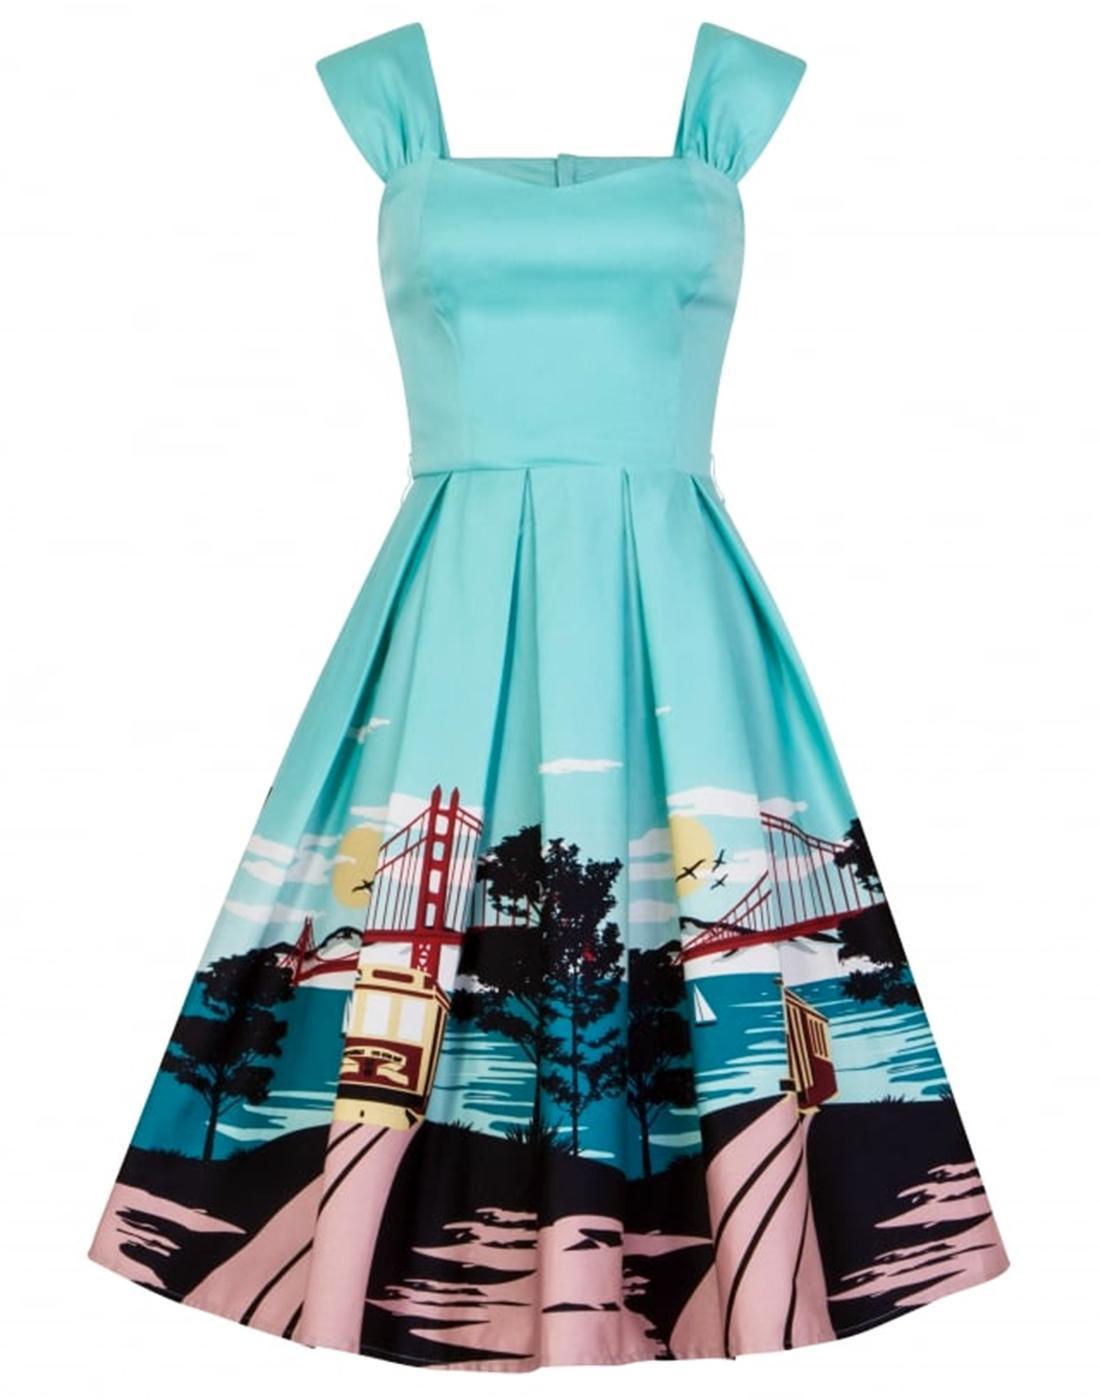 Jill COLLECTIF San Francisco Print Retro 50s Dress